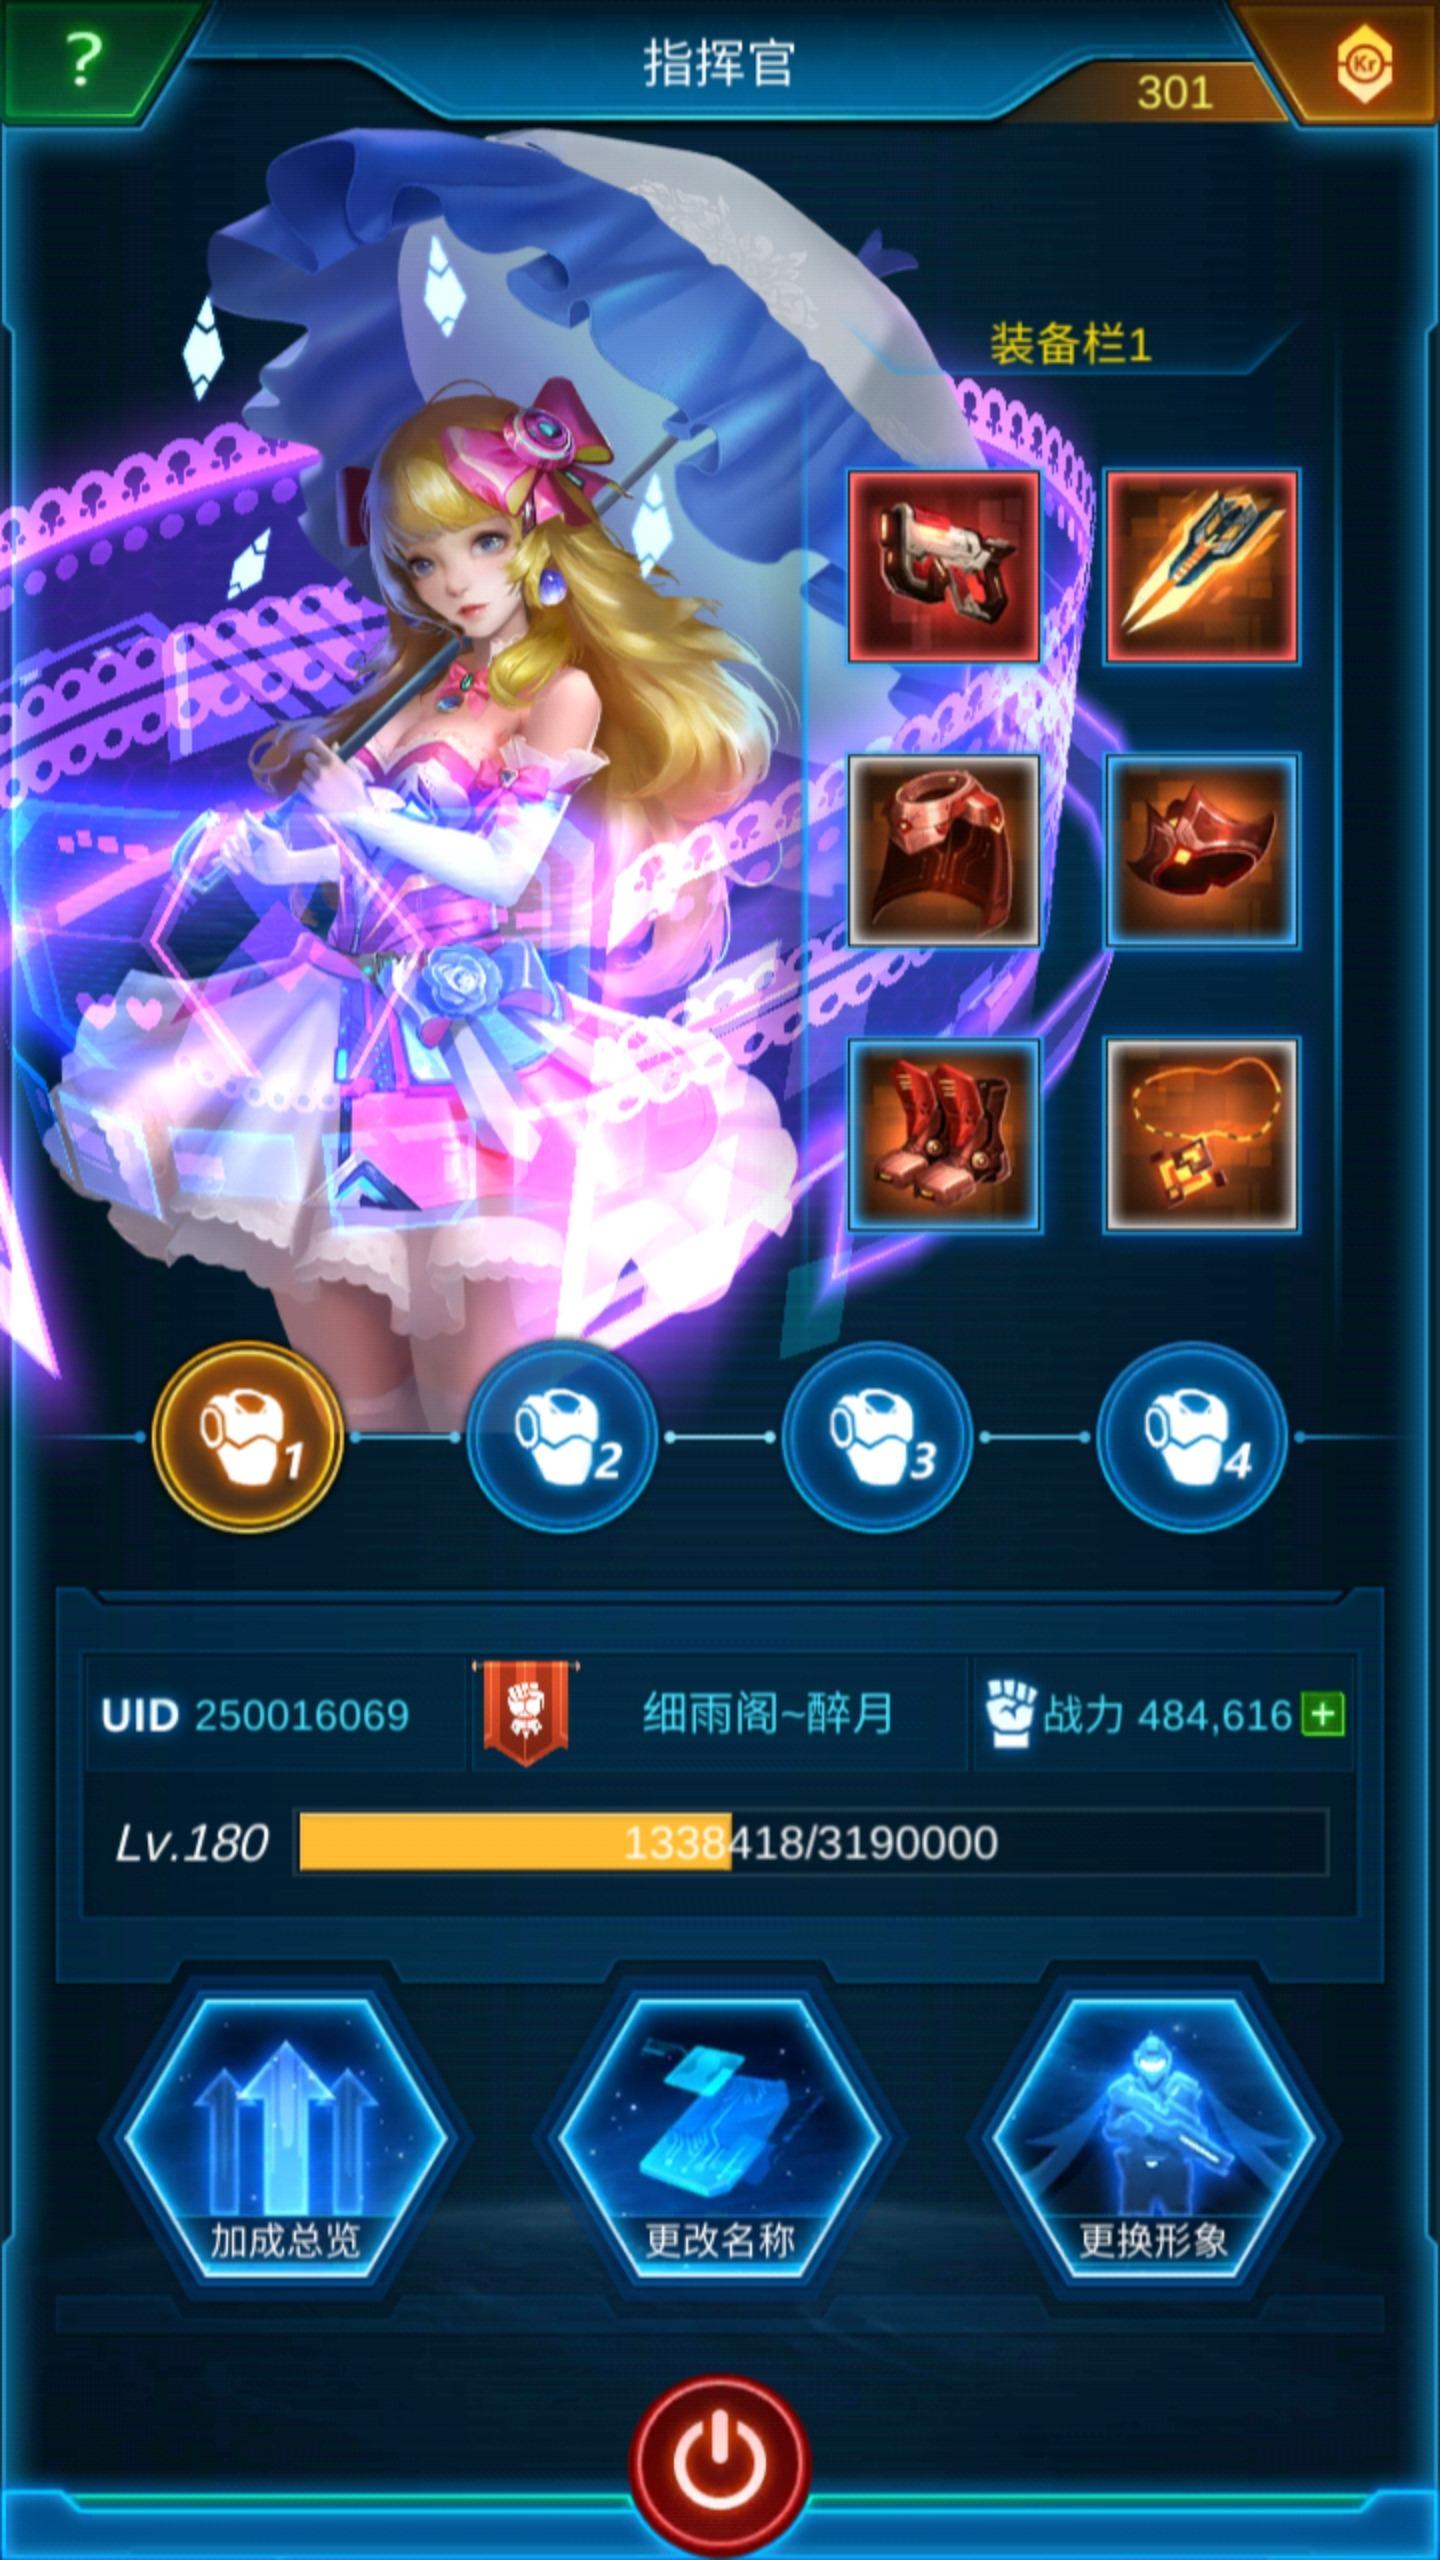 Screenshot_20210507_234714_com.jedigames.p16s.huawei.jpg